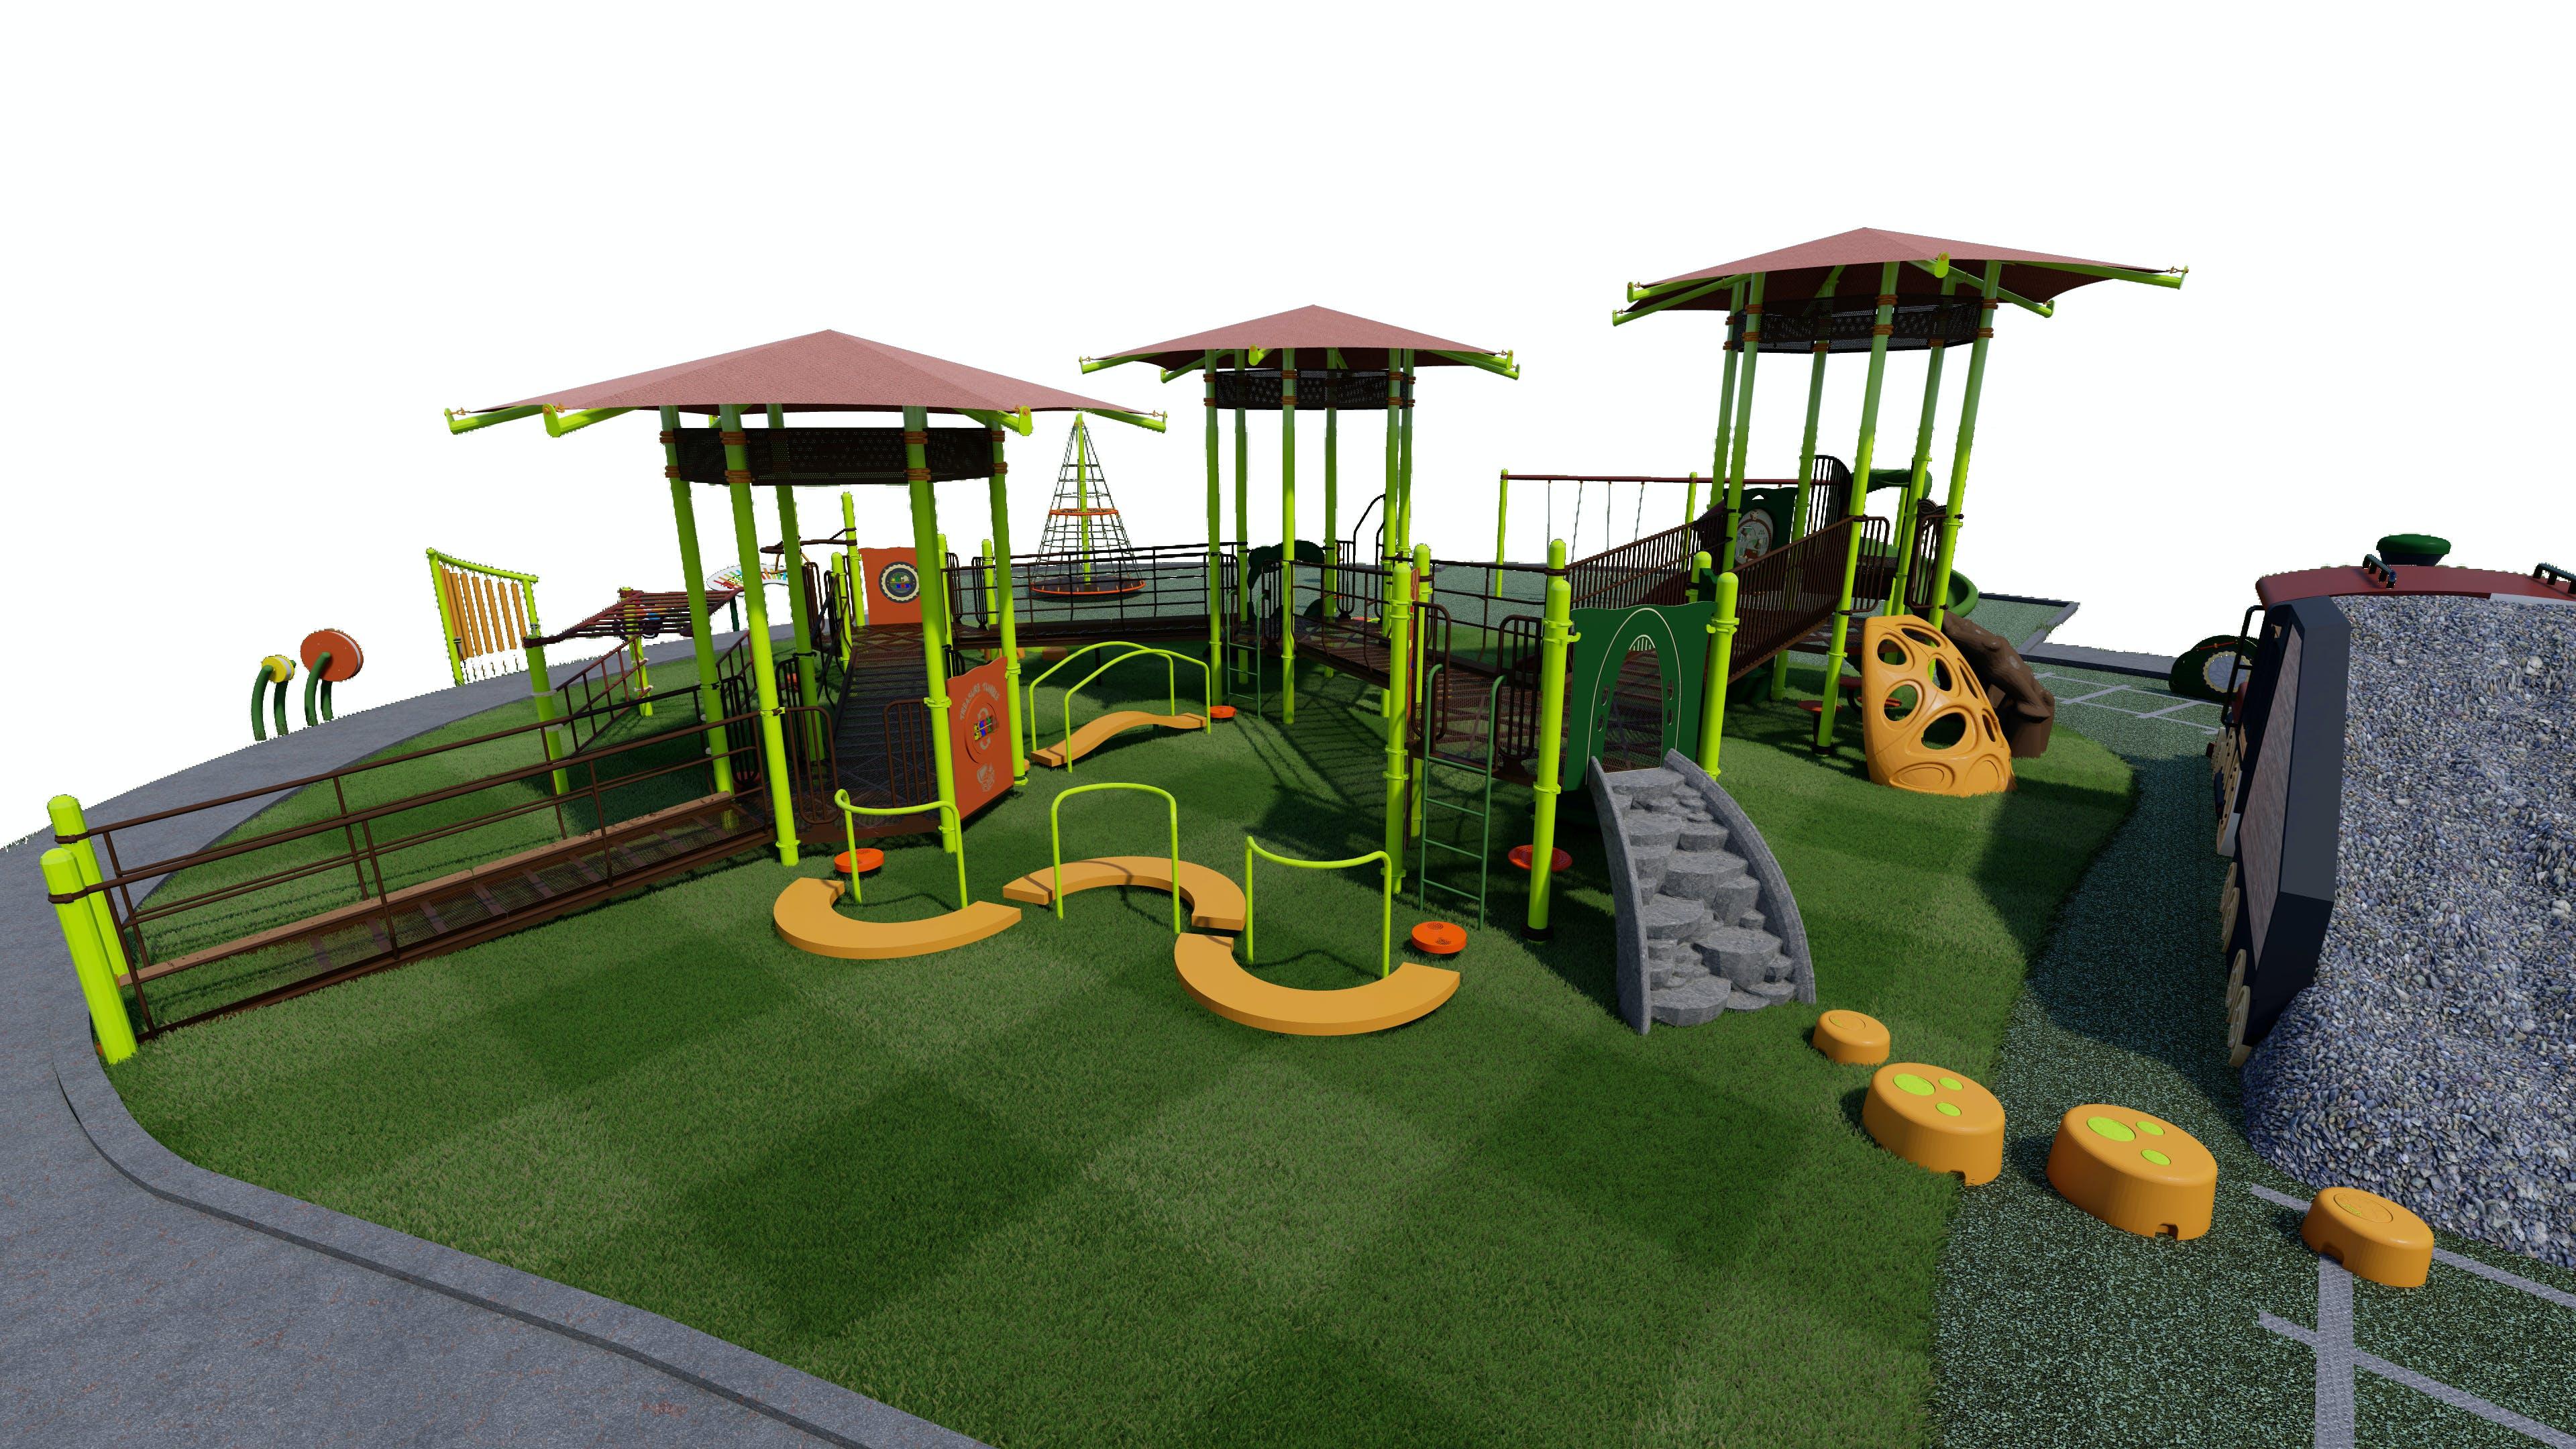 Preferred Playground Design View 2